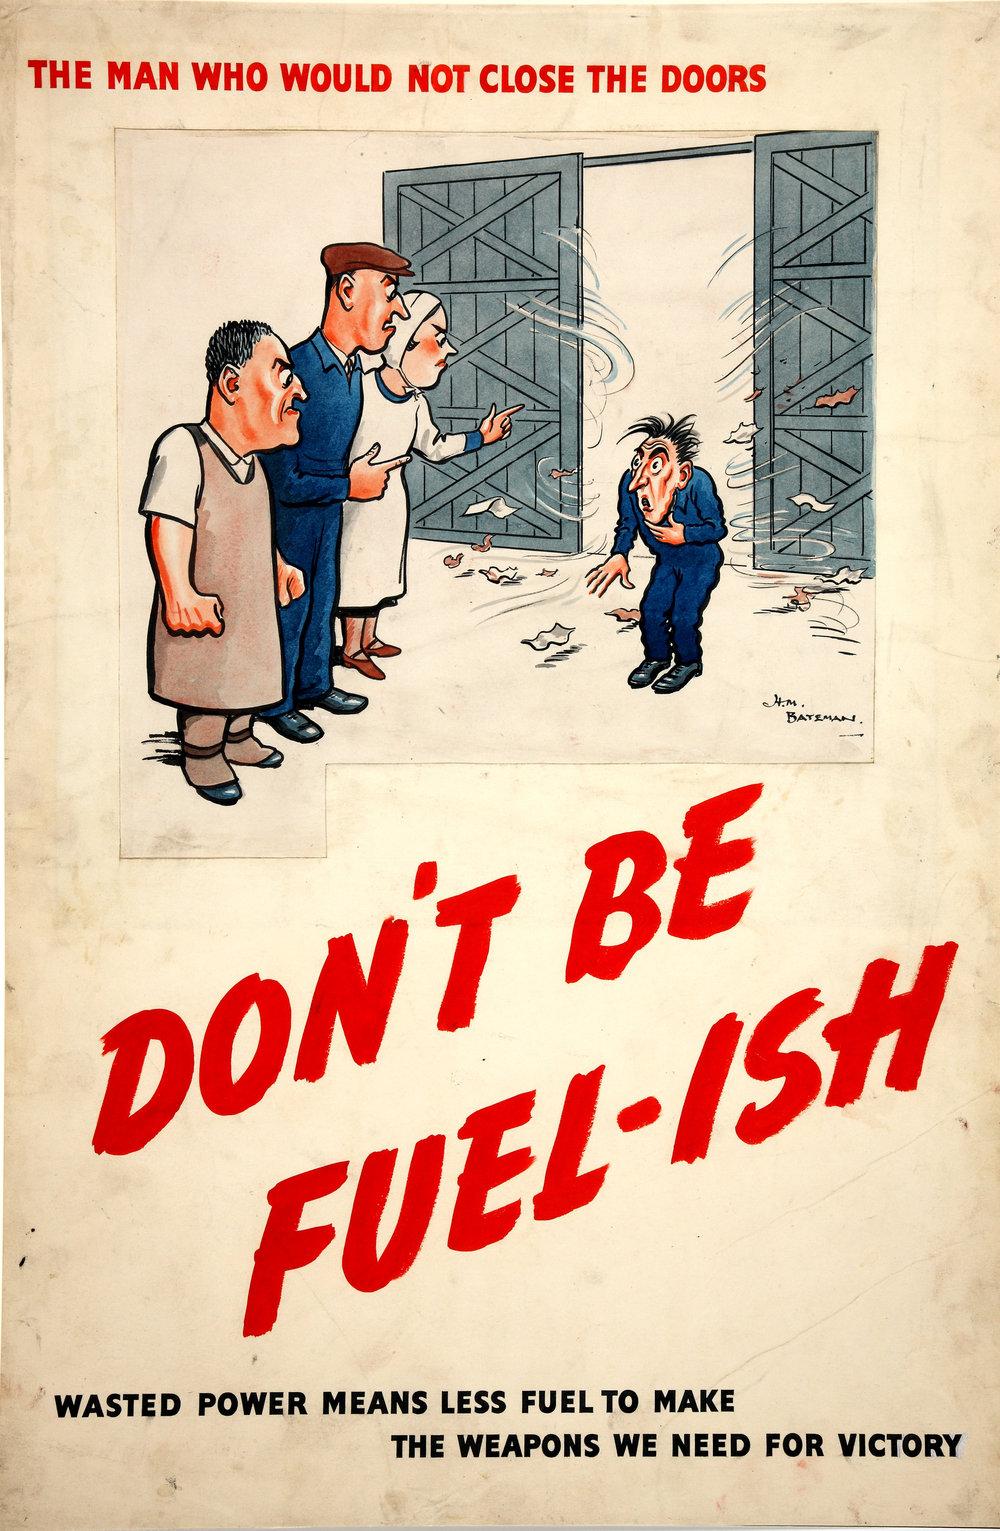 fuelish